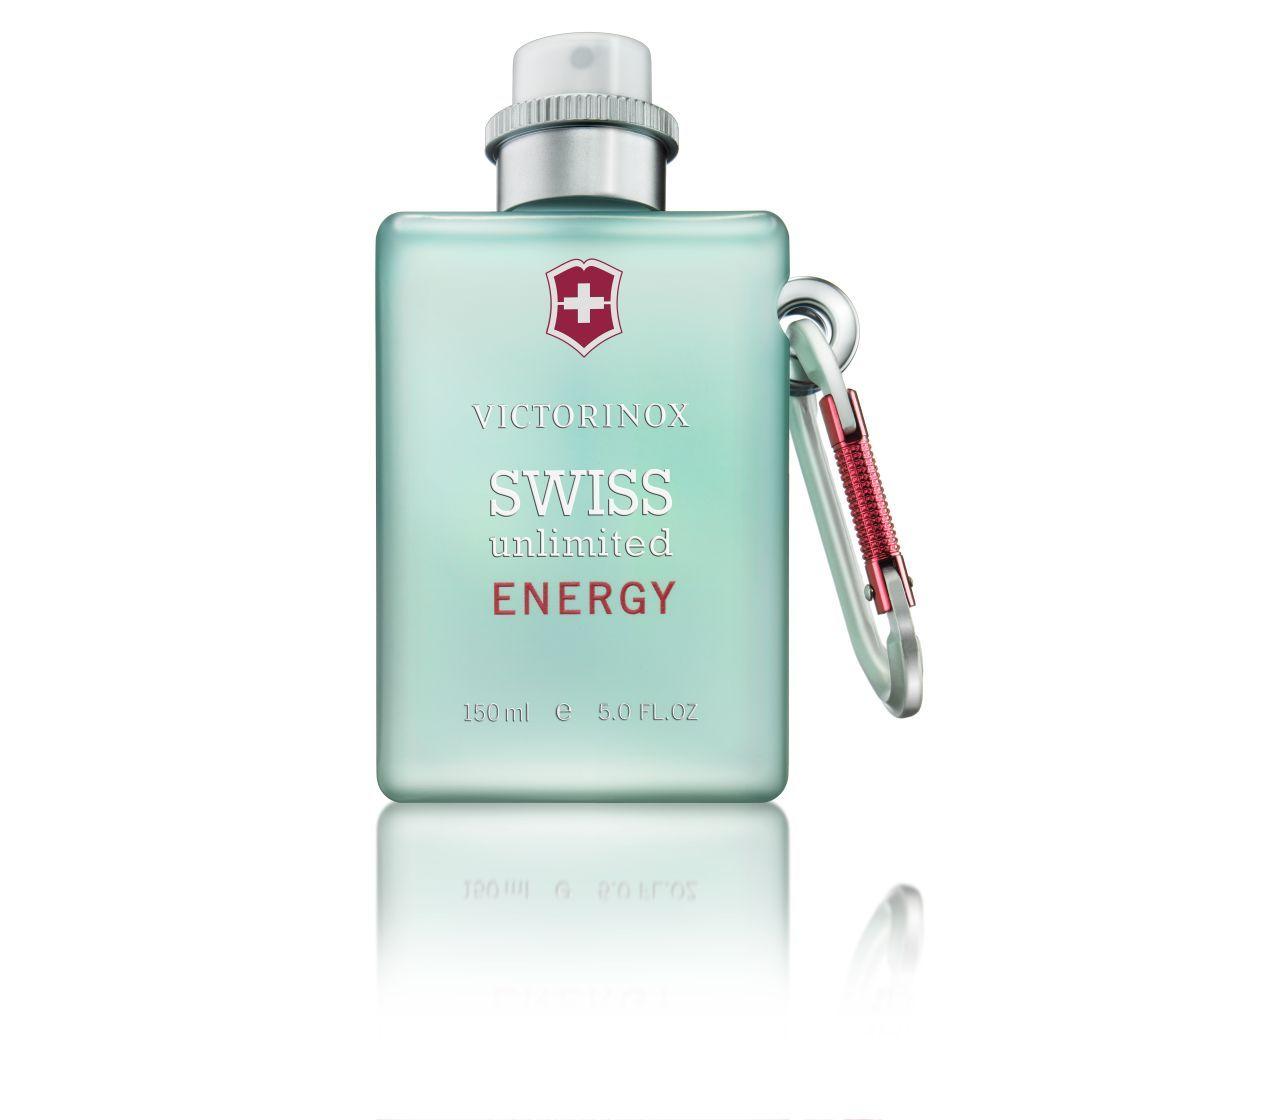 Victorinox Swiss Unlimited Energy Cologne 150ml For Men Light